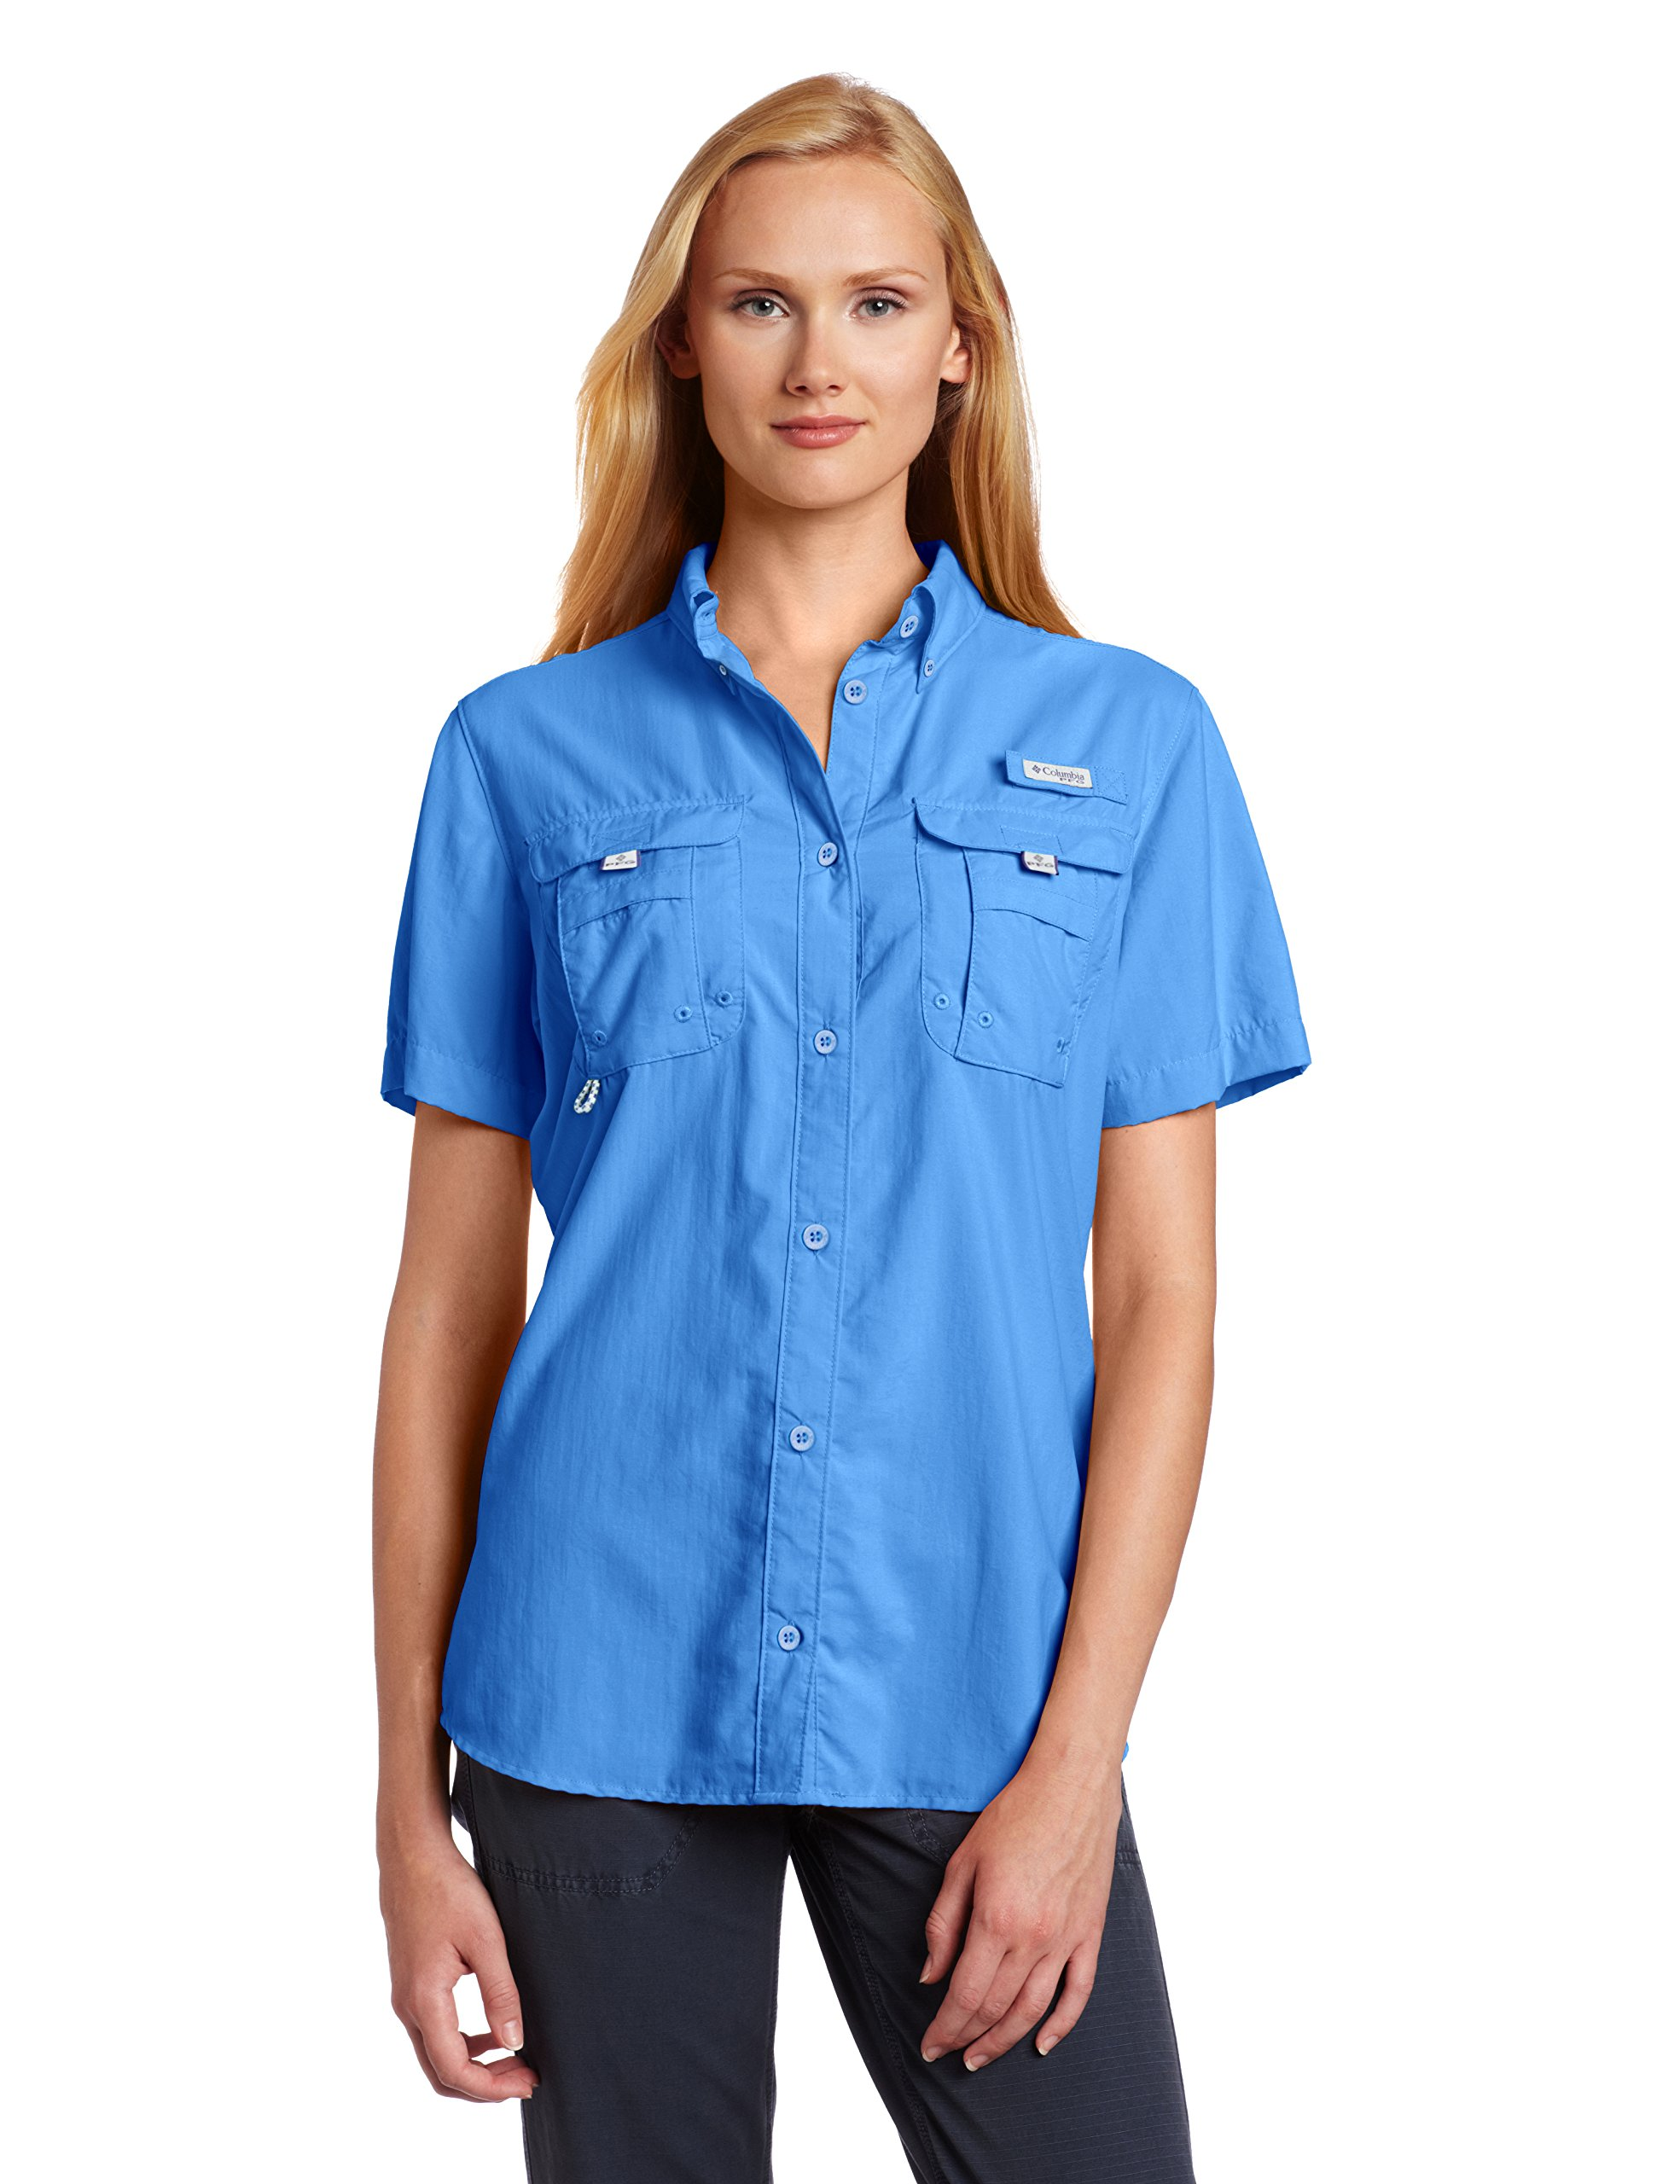 Columbia Women's PFG Bahama Short Sleeve Shirt , Harbor Blue, X-Small by Columbia